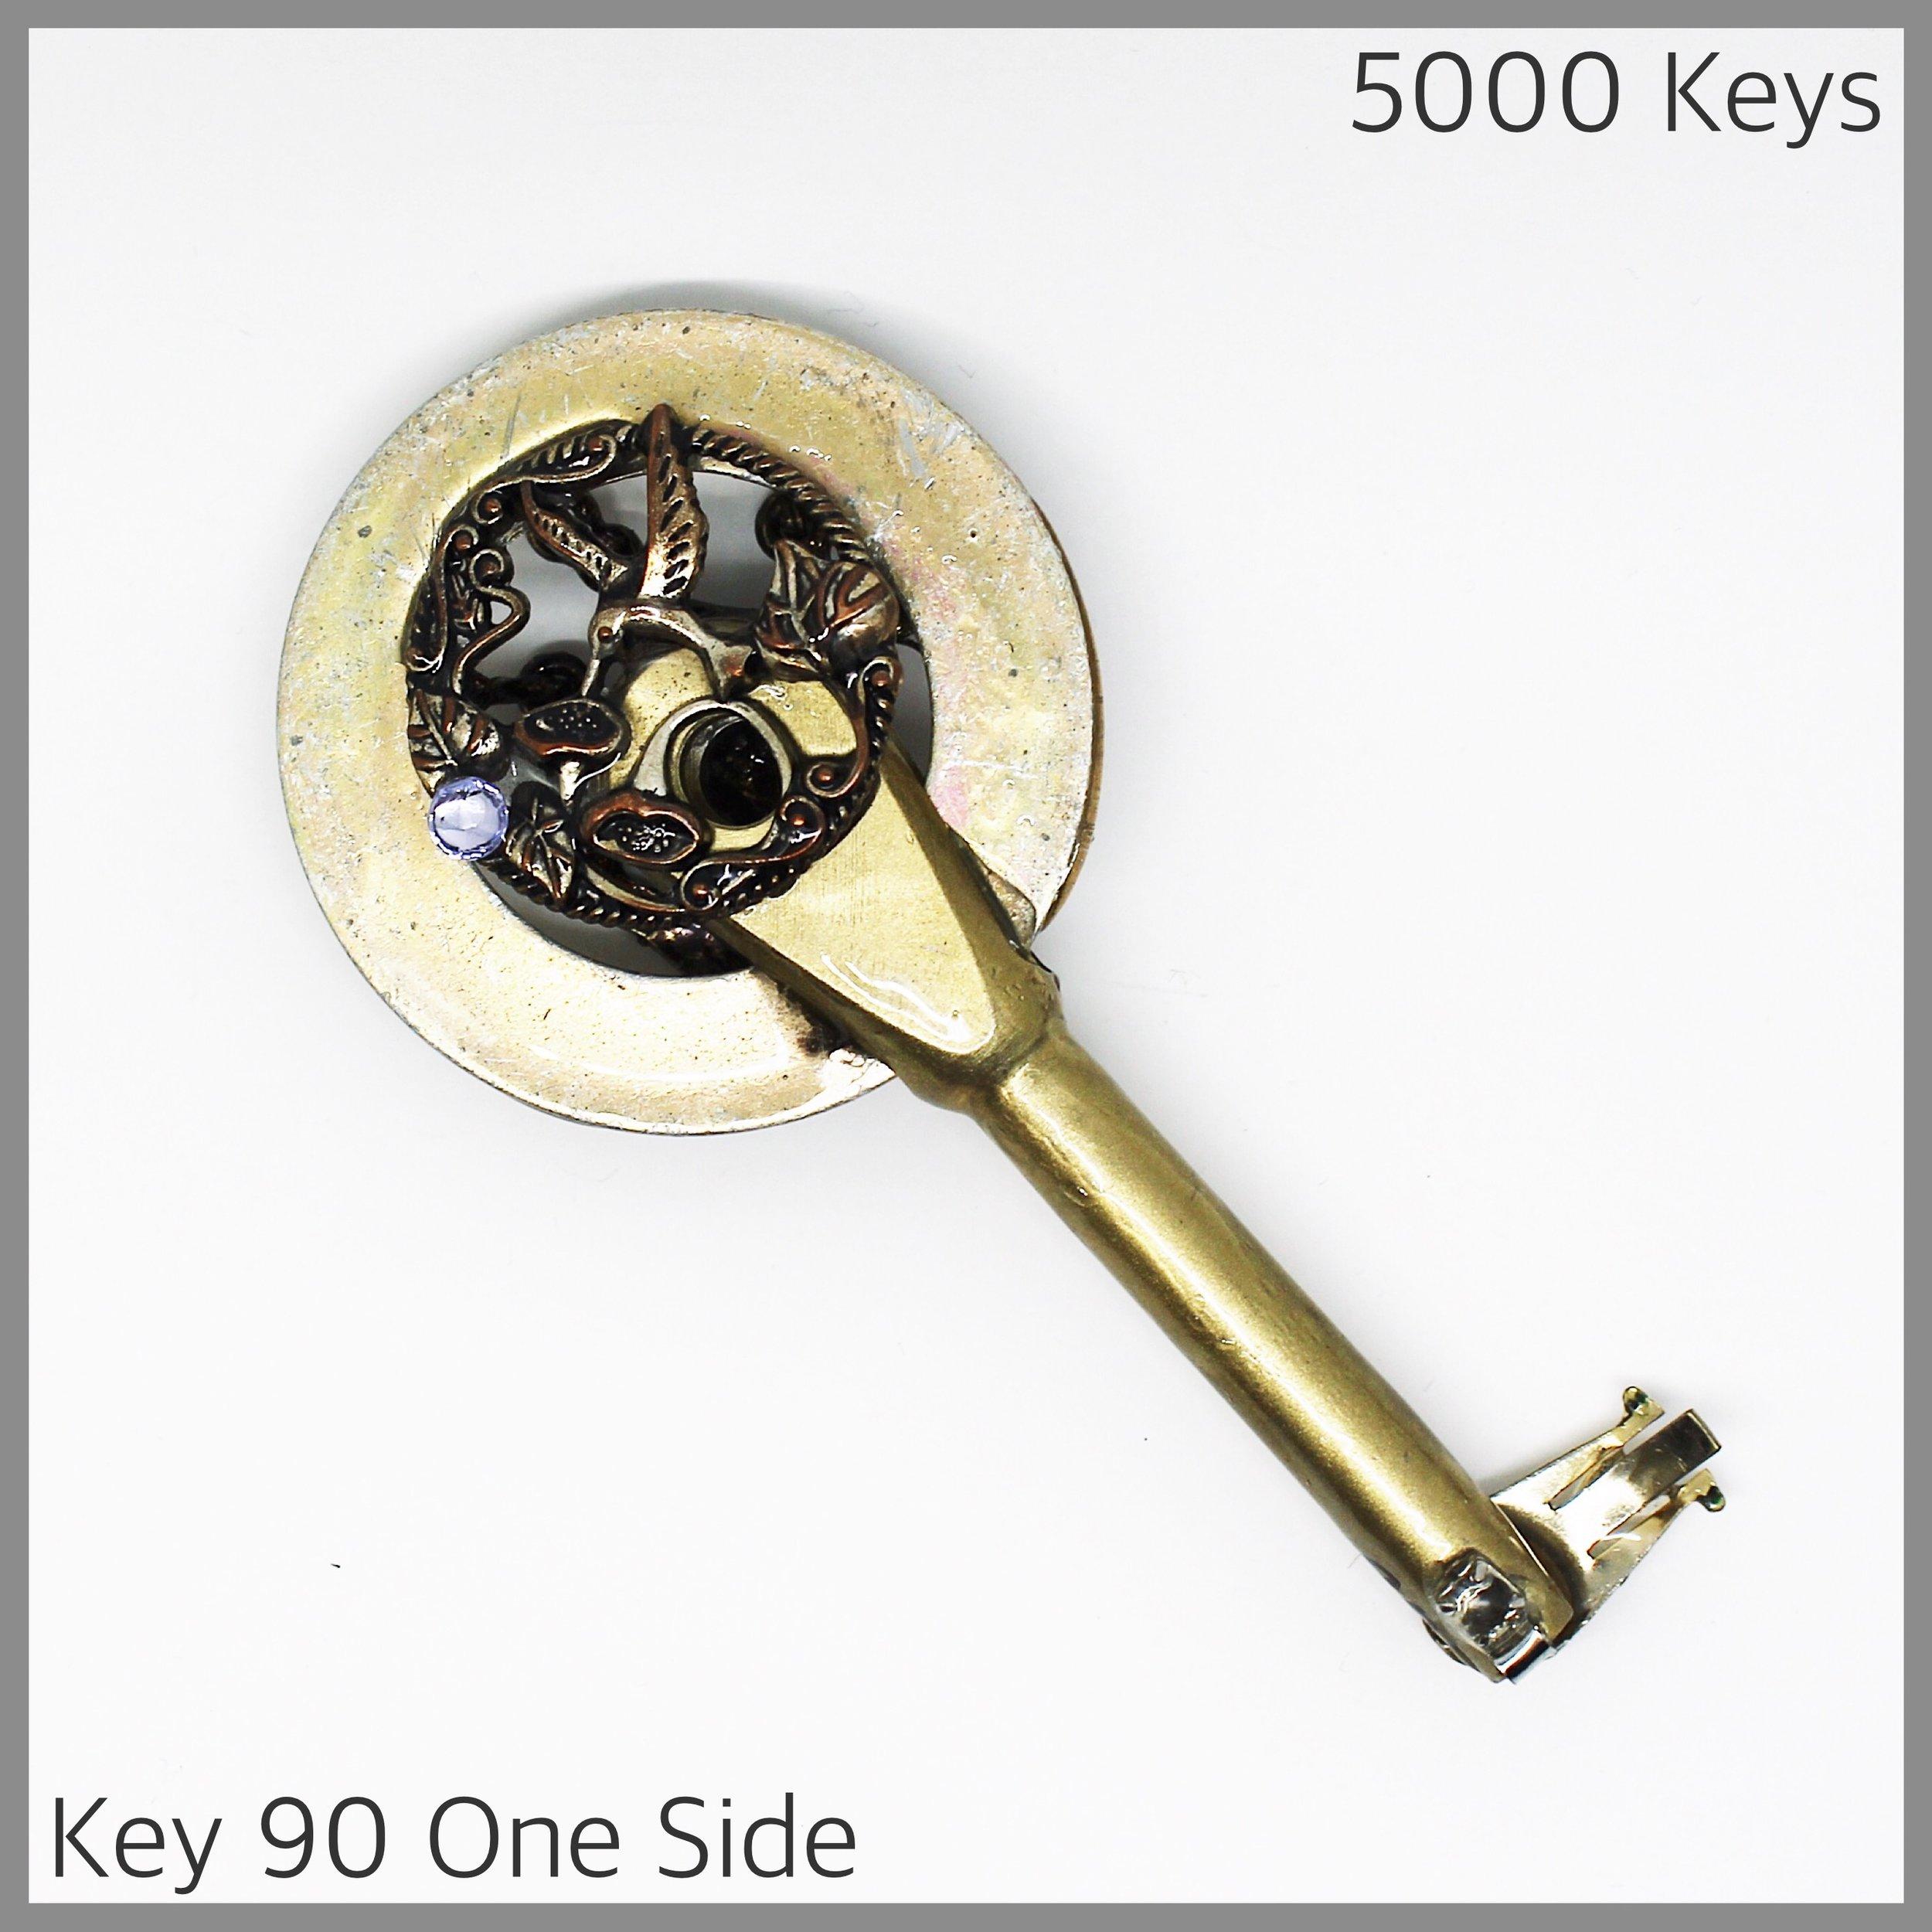 Key 90 one side - 1.JPG